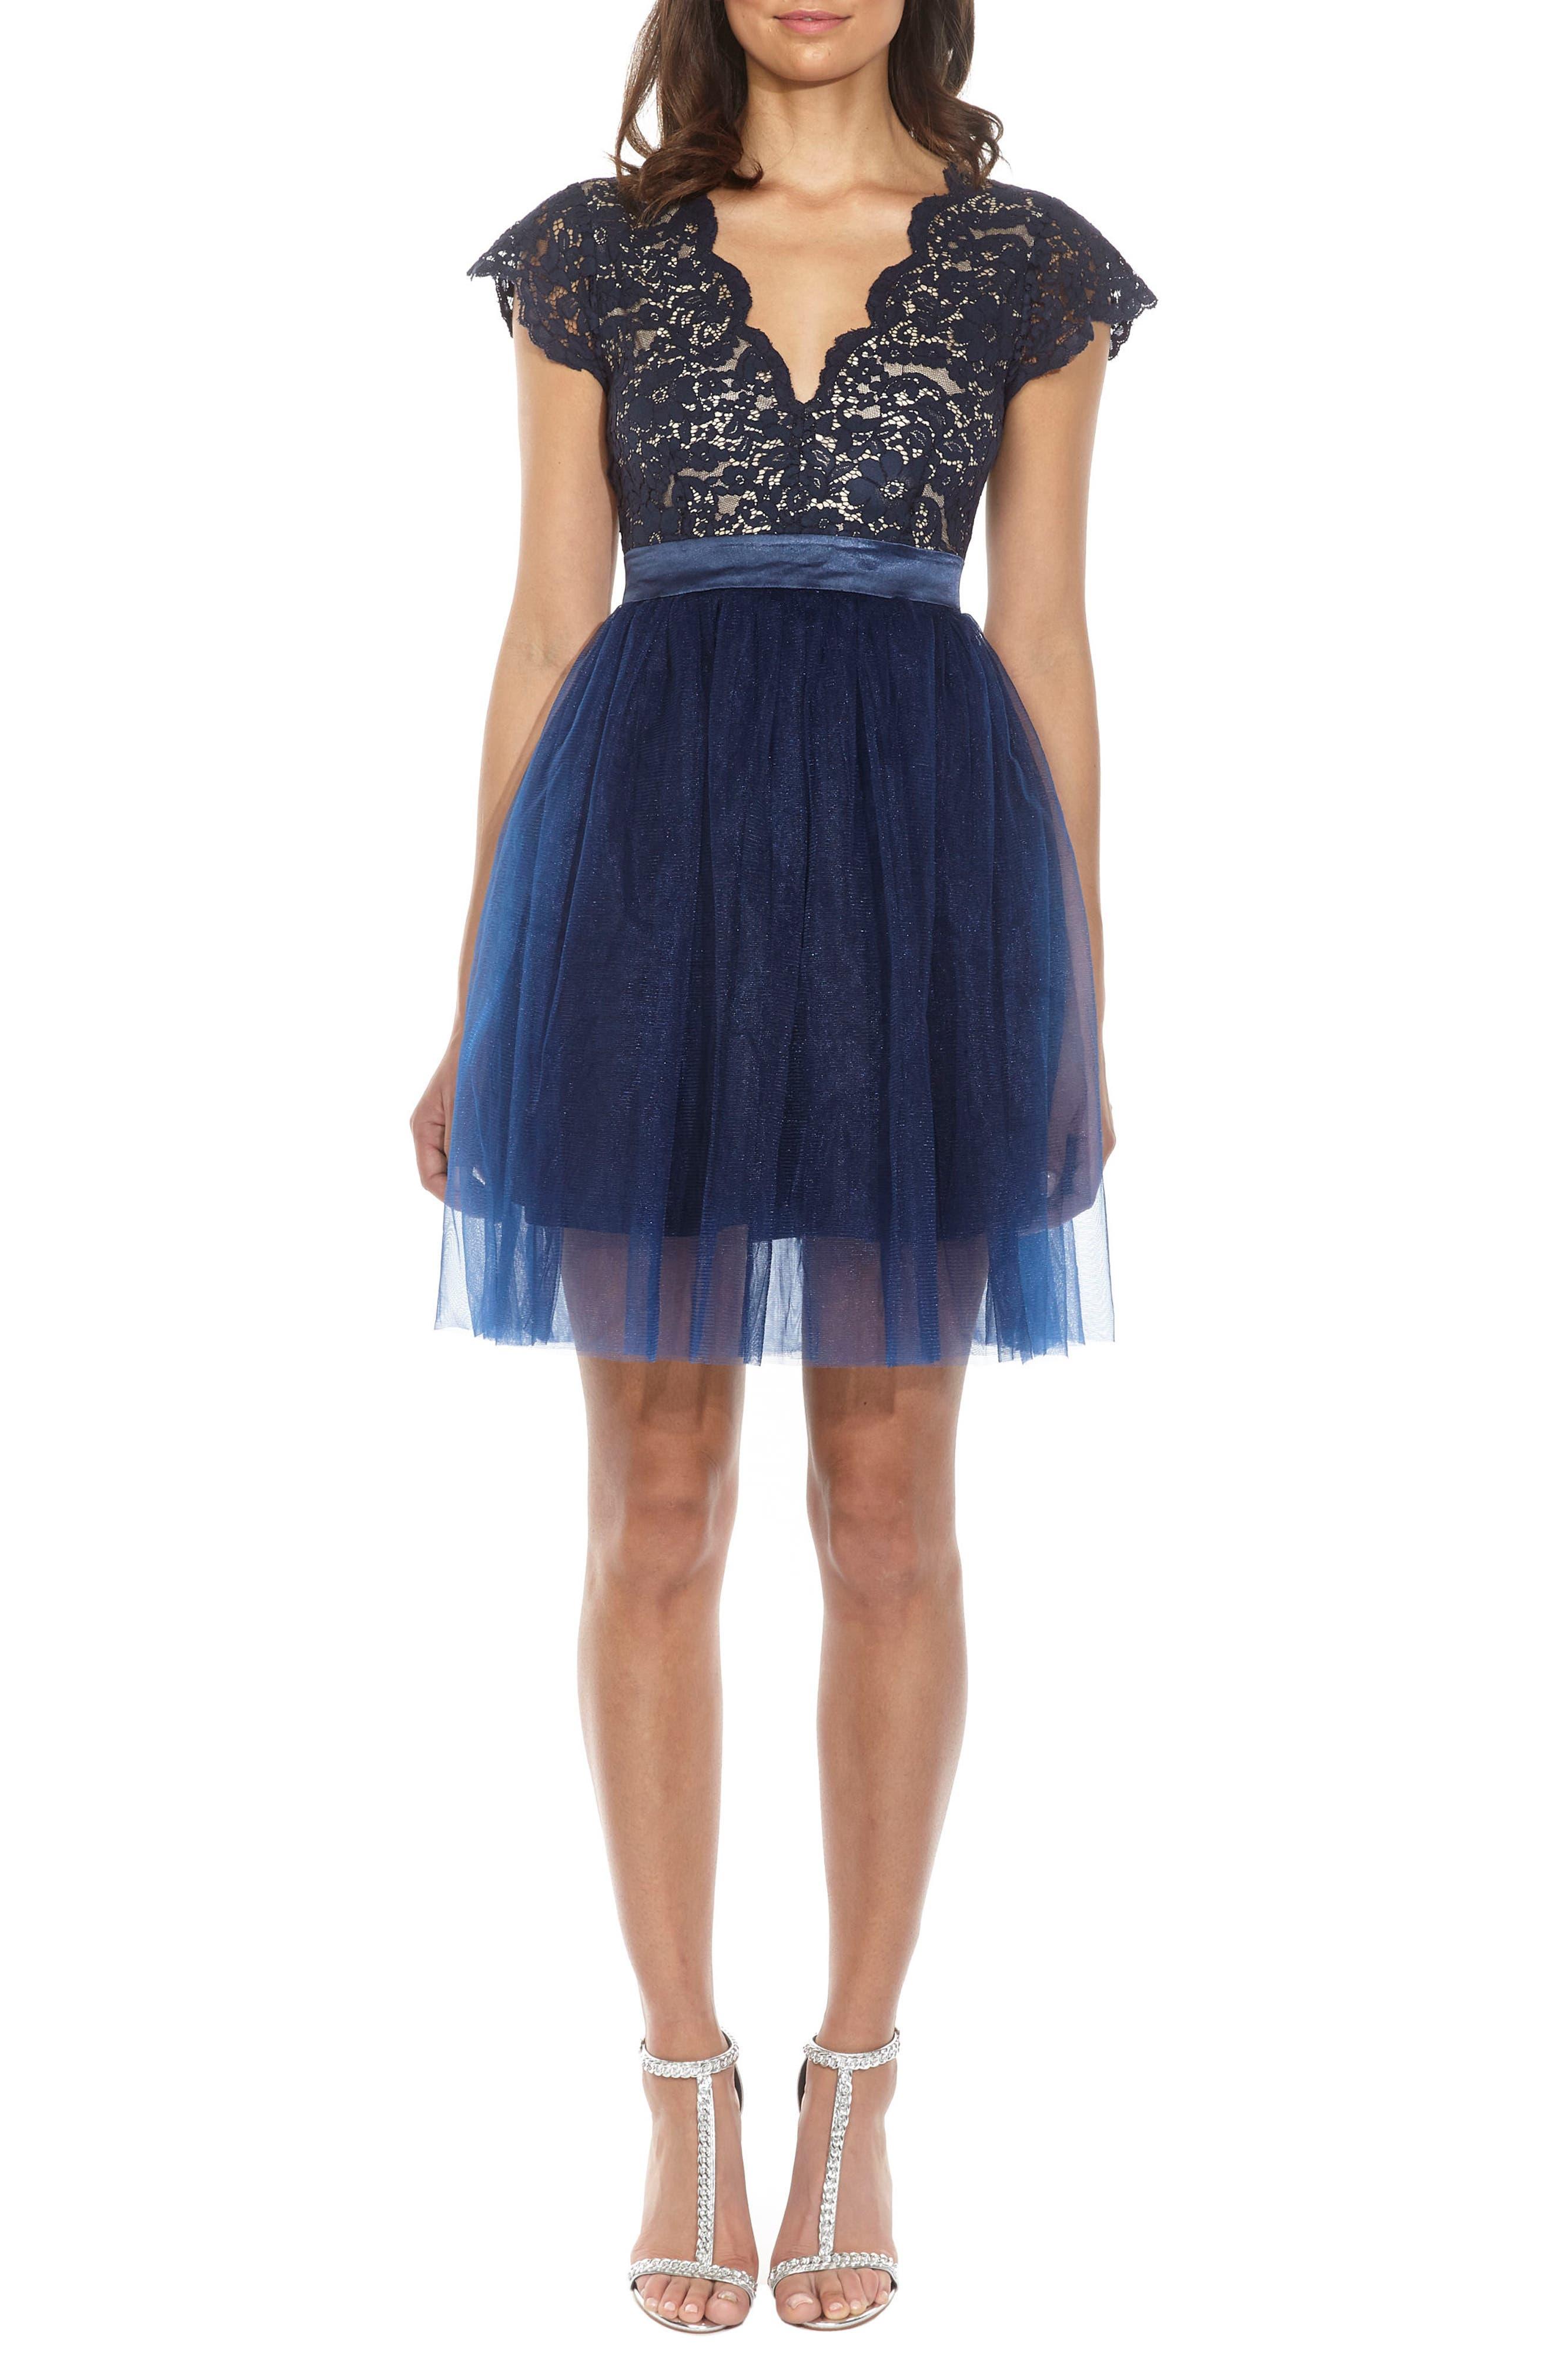 Macen Scalloped Lace Skater Dress,                         Main,                         color,